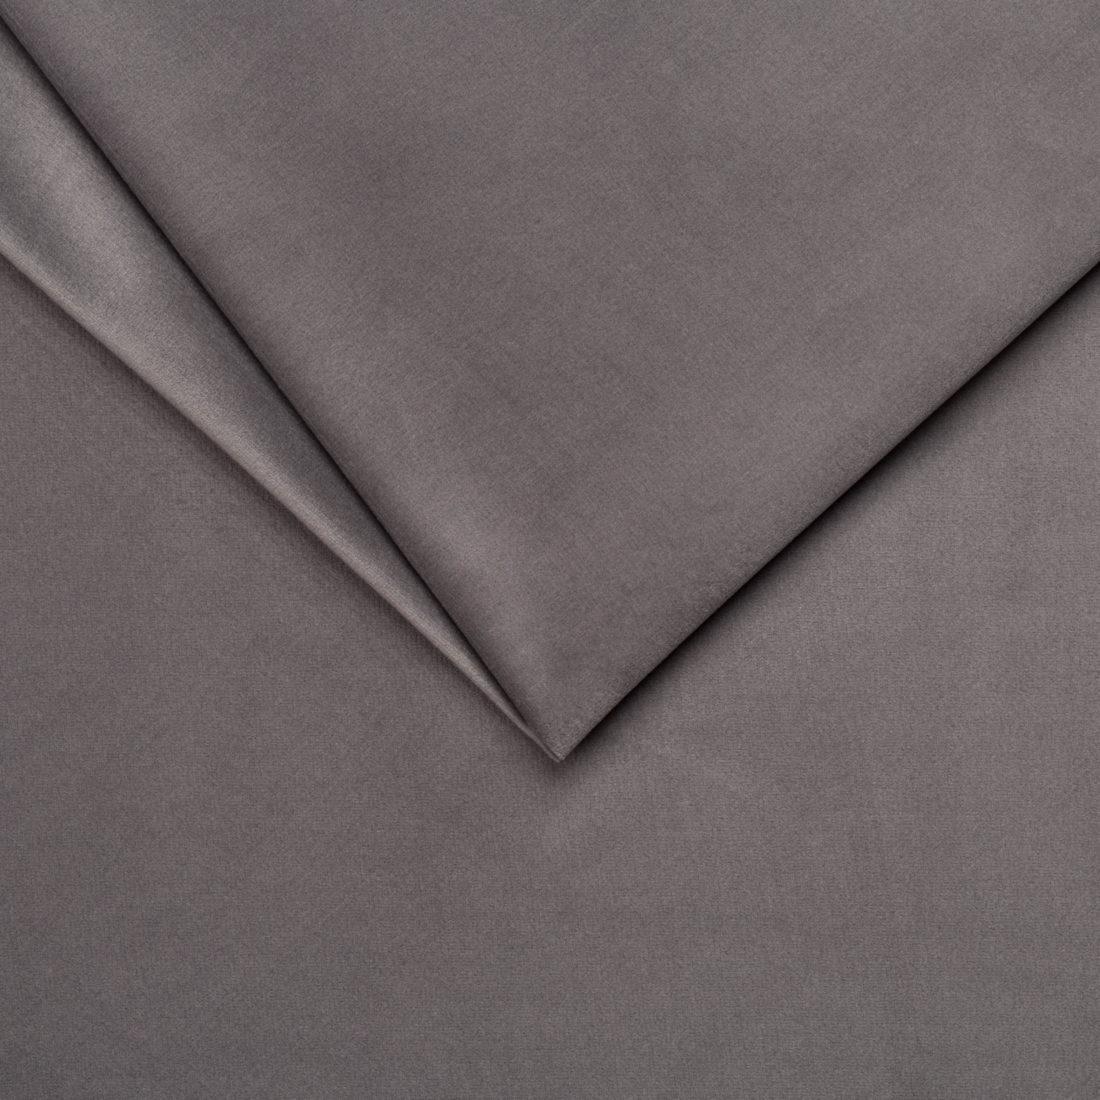 Мебельная ткань Velluto 16 Grey, велюр